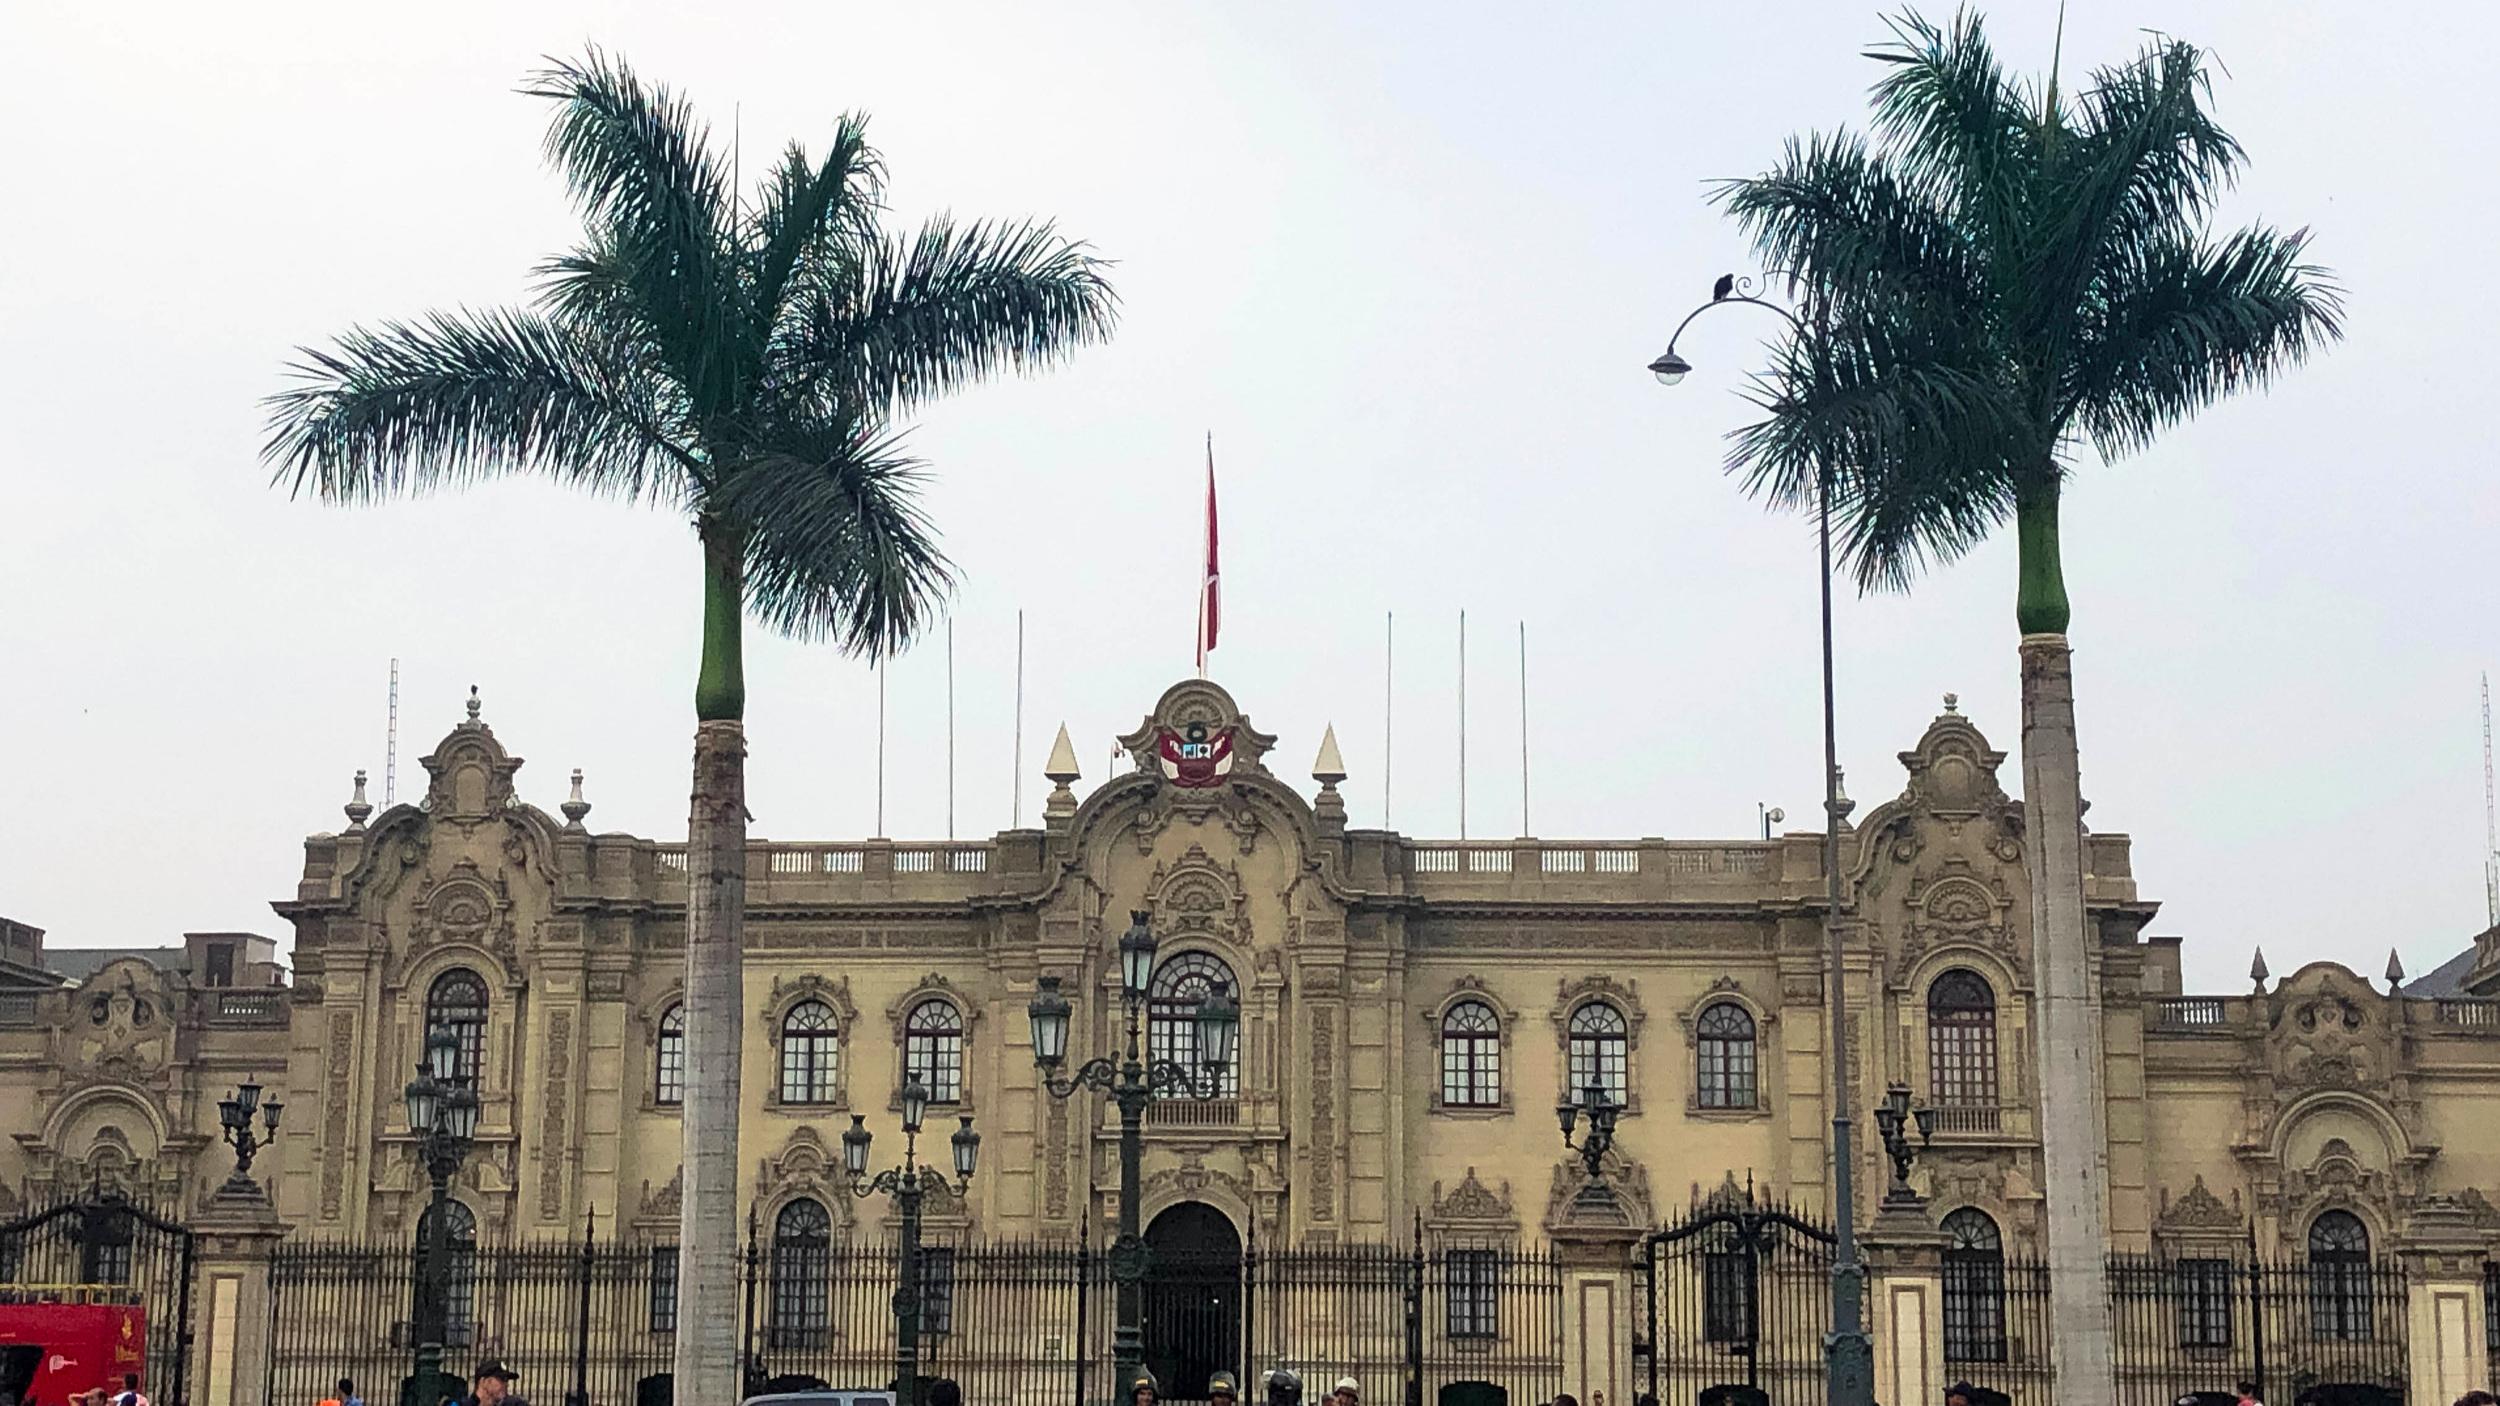 Beautiful historic buildings in the Plaza De Armas